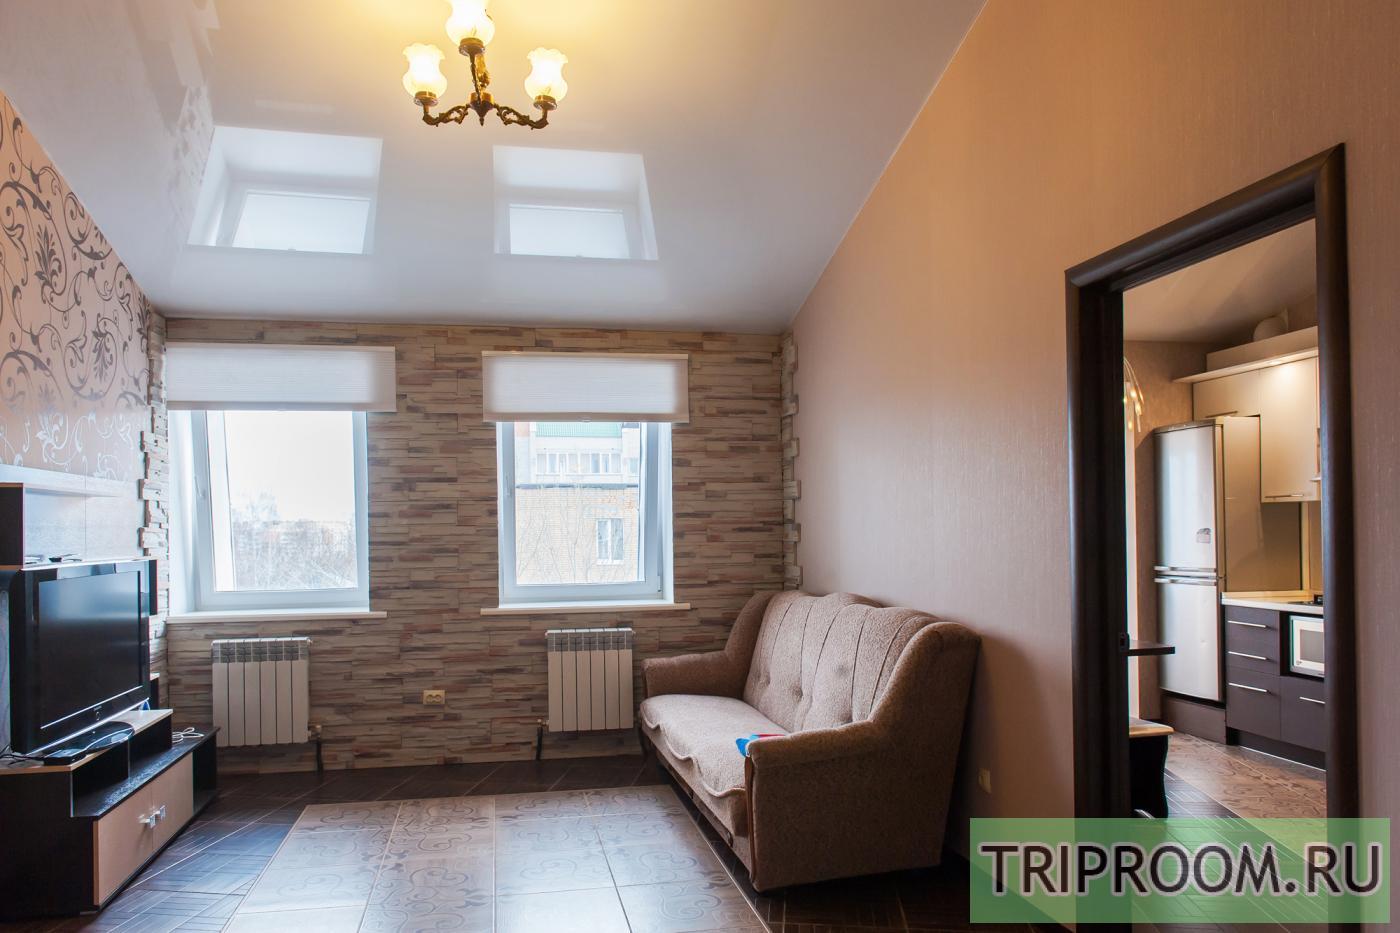 2-комнатная квартира посуточно (вариант № 12765), ул. Кронштадский переулок, фото № 1